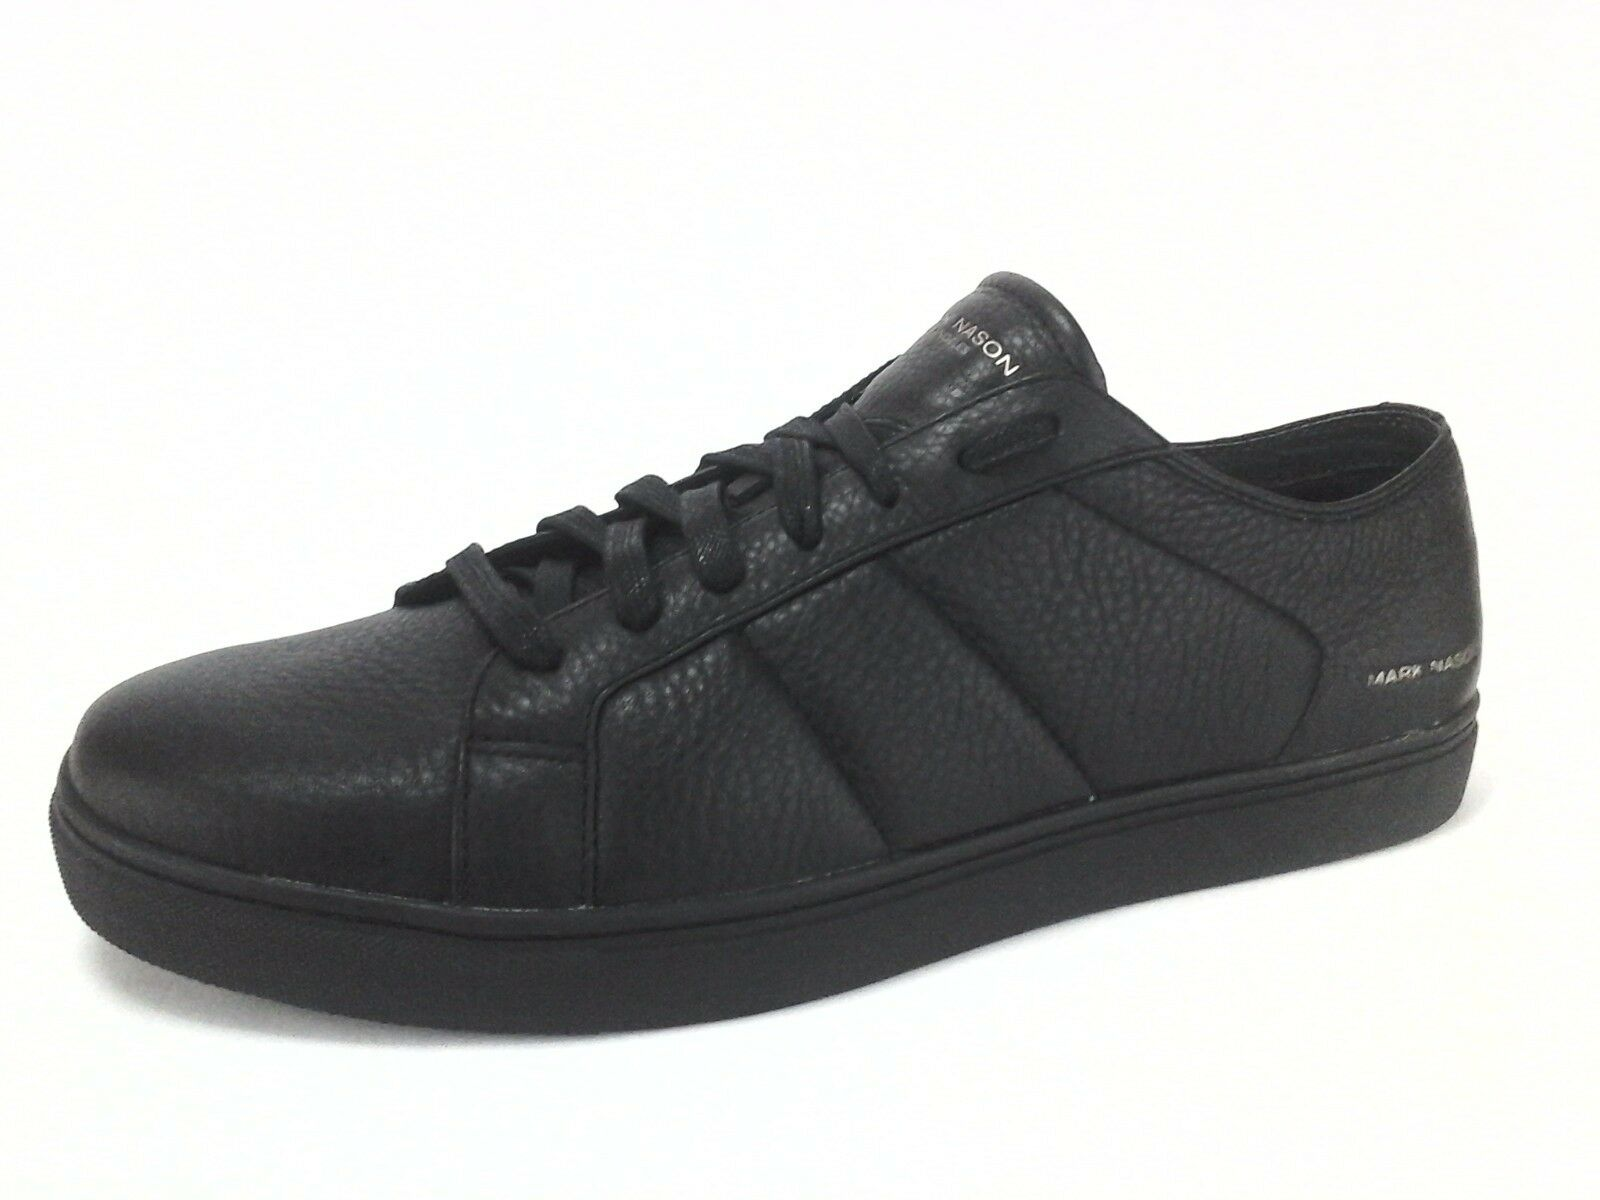 Mark Nason Mens Black Genuine Leather Venice Sneakers shoes US 13 EU 47.5 NWOB